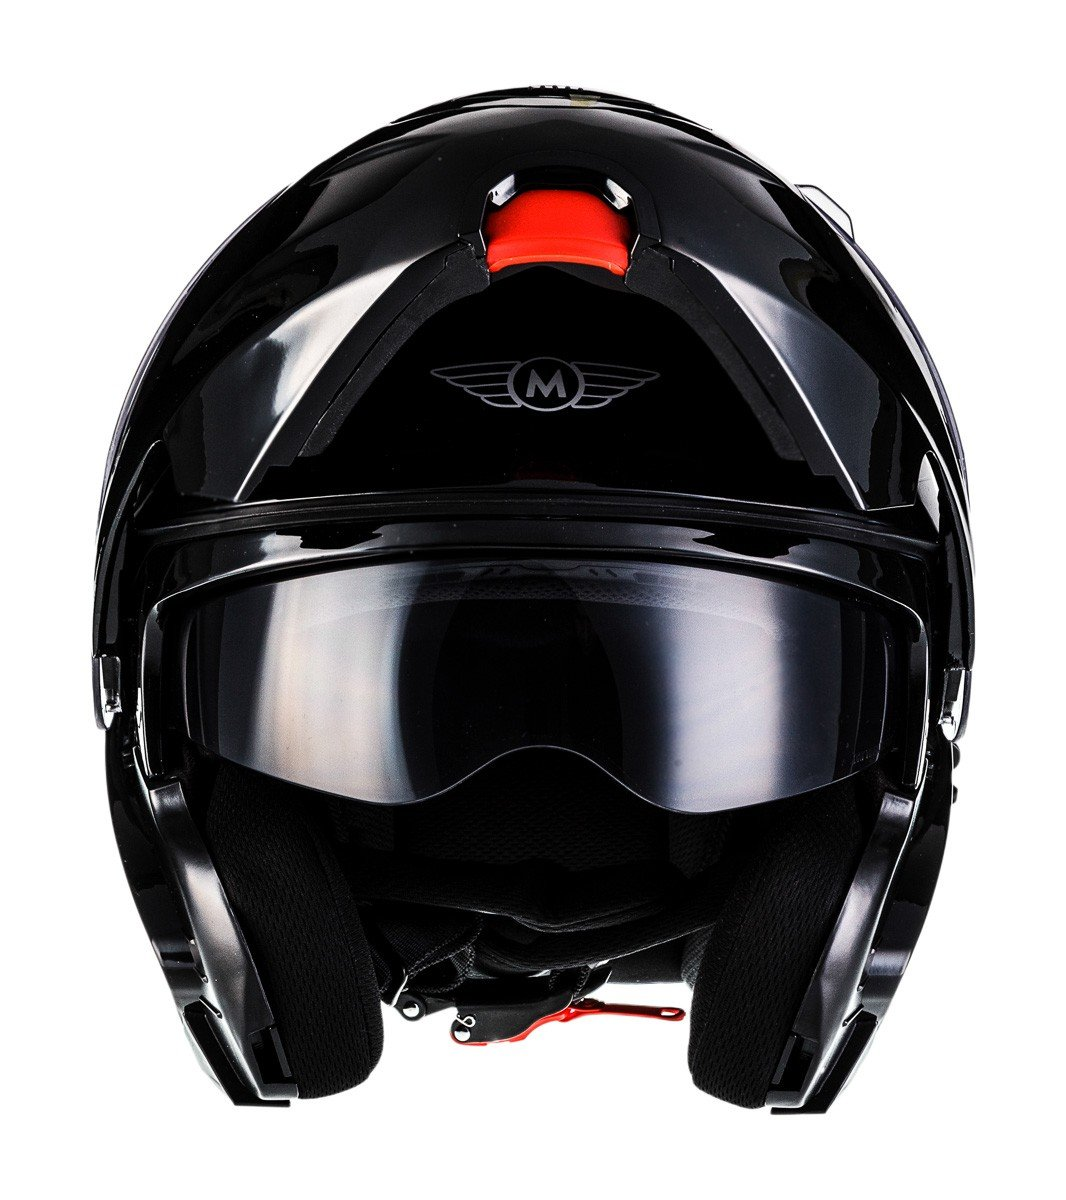 MOTO F19 Matt White /· Scooter Urbano Sport Moto Modular-Helmet Integrale Casco da motocicletta modulare Urban Flip-Up Cruiser /· ECE certificado /· dos viseras incluidas /· incluyendo bolsa de casco /· Blanco /· M 57-5